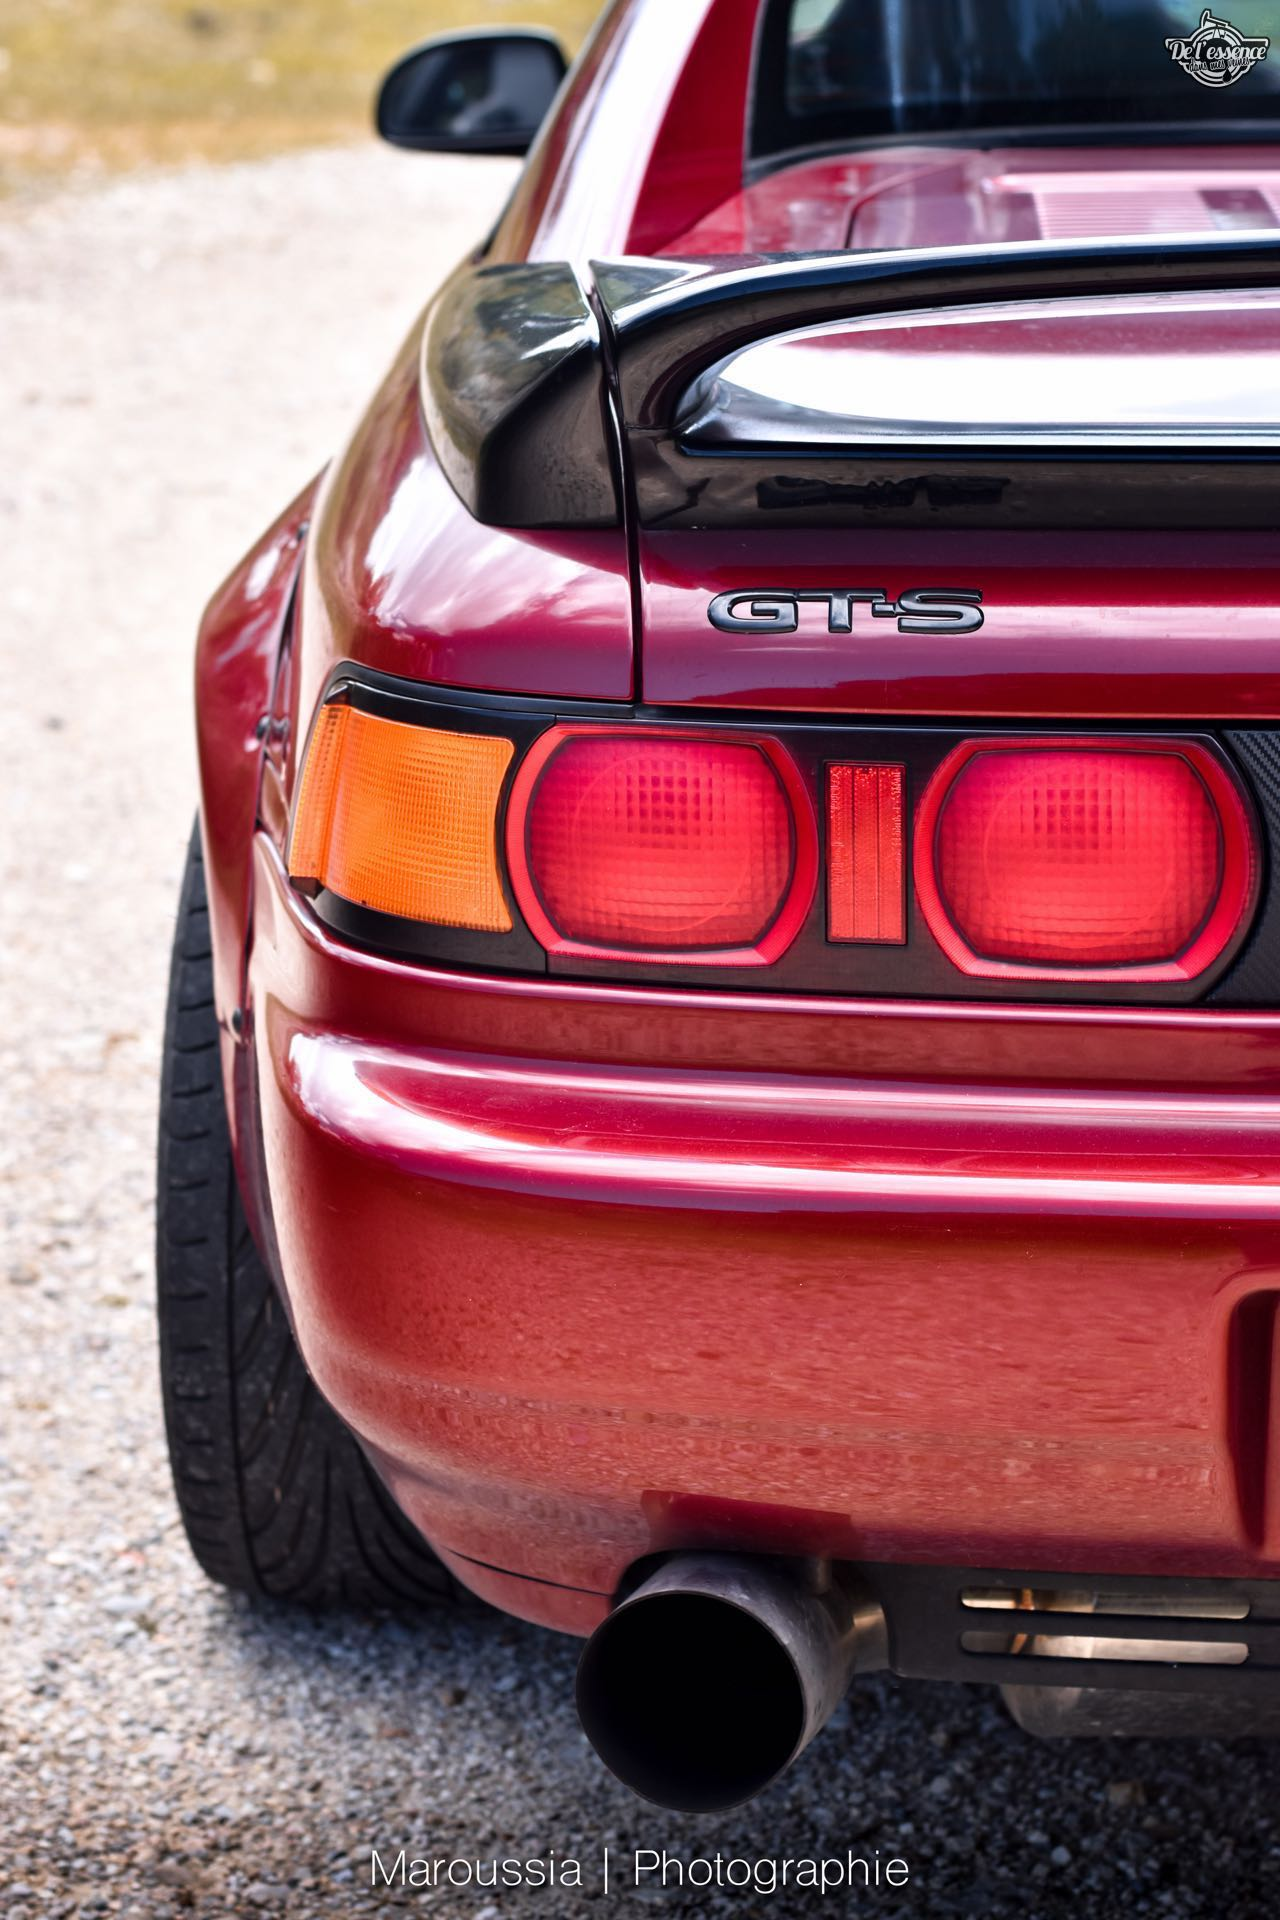 '91 Tay's Toyota MR2 - D'atmo à Turbo... 2